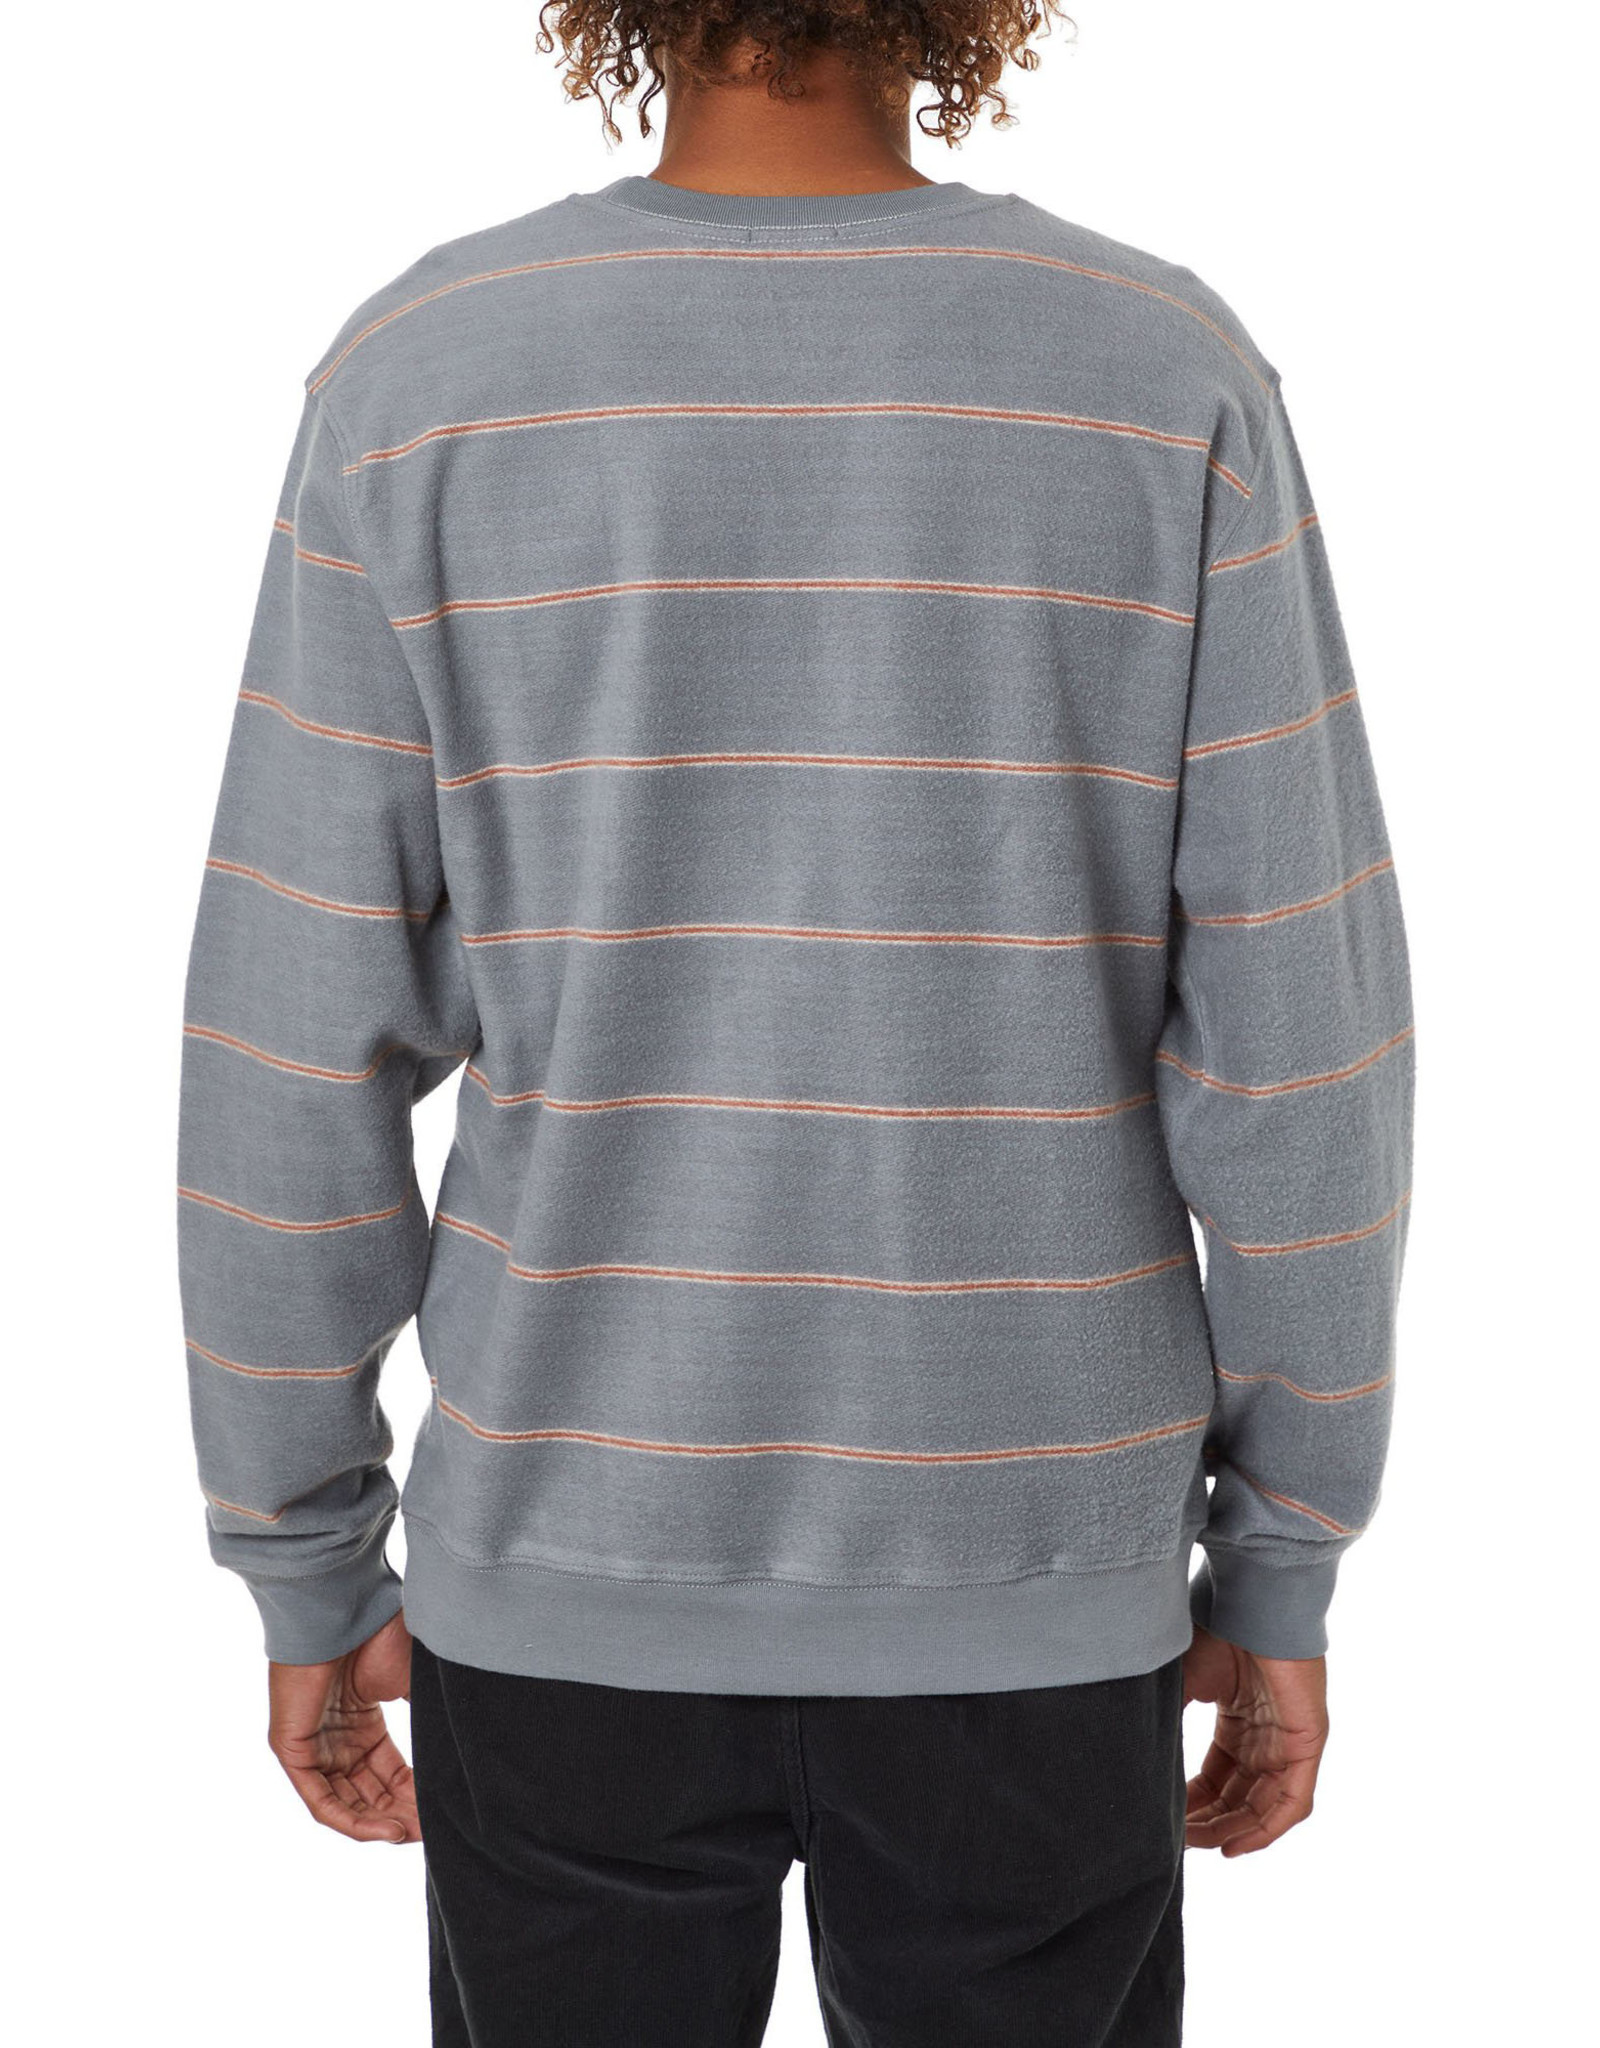 Katin Parks Sweatshirt - Steel Blue